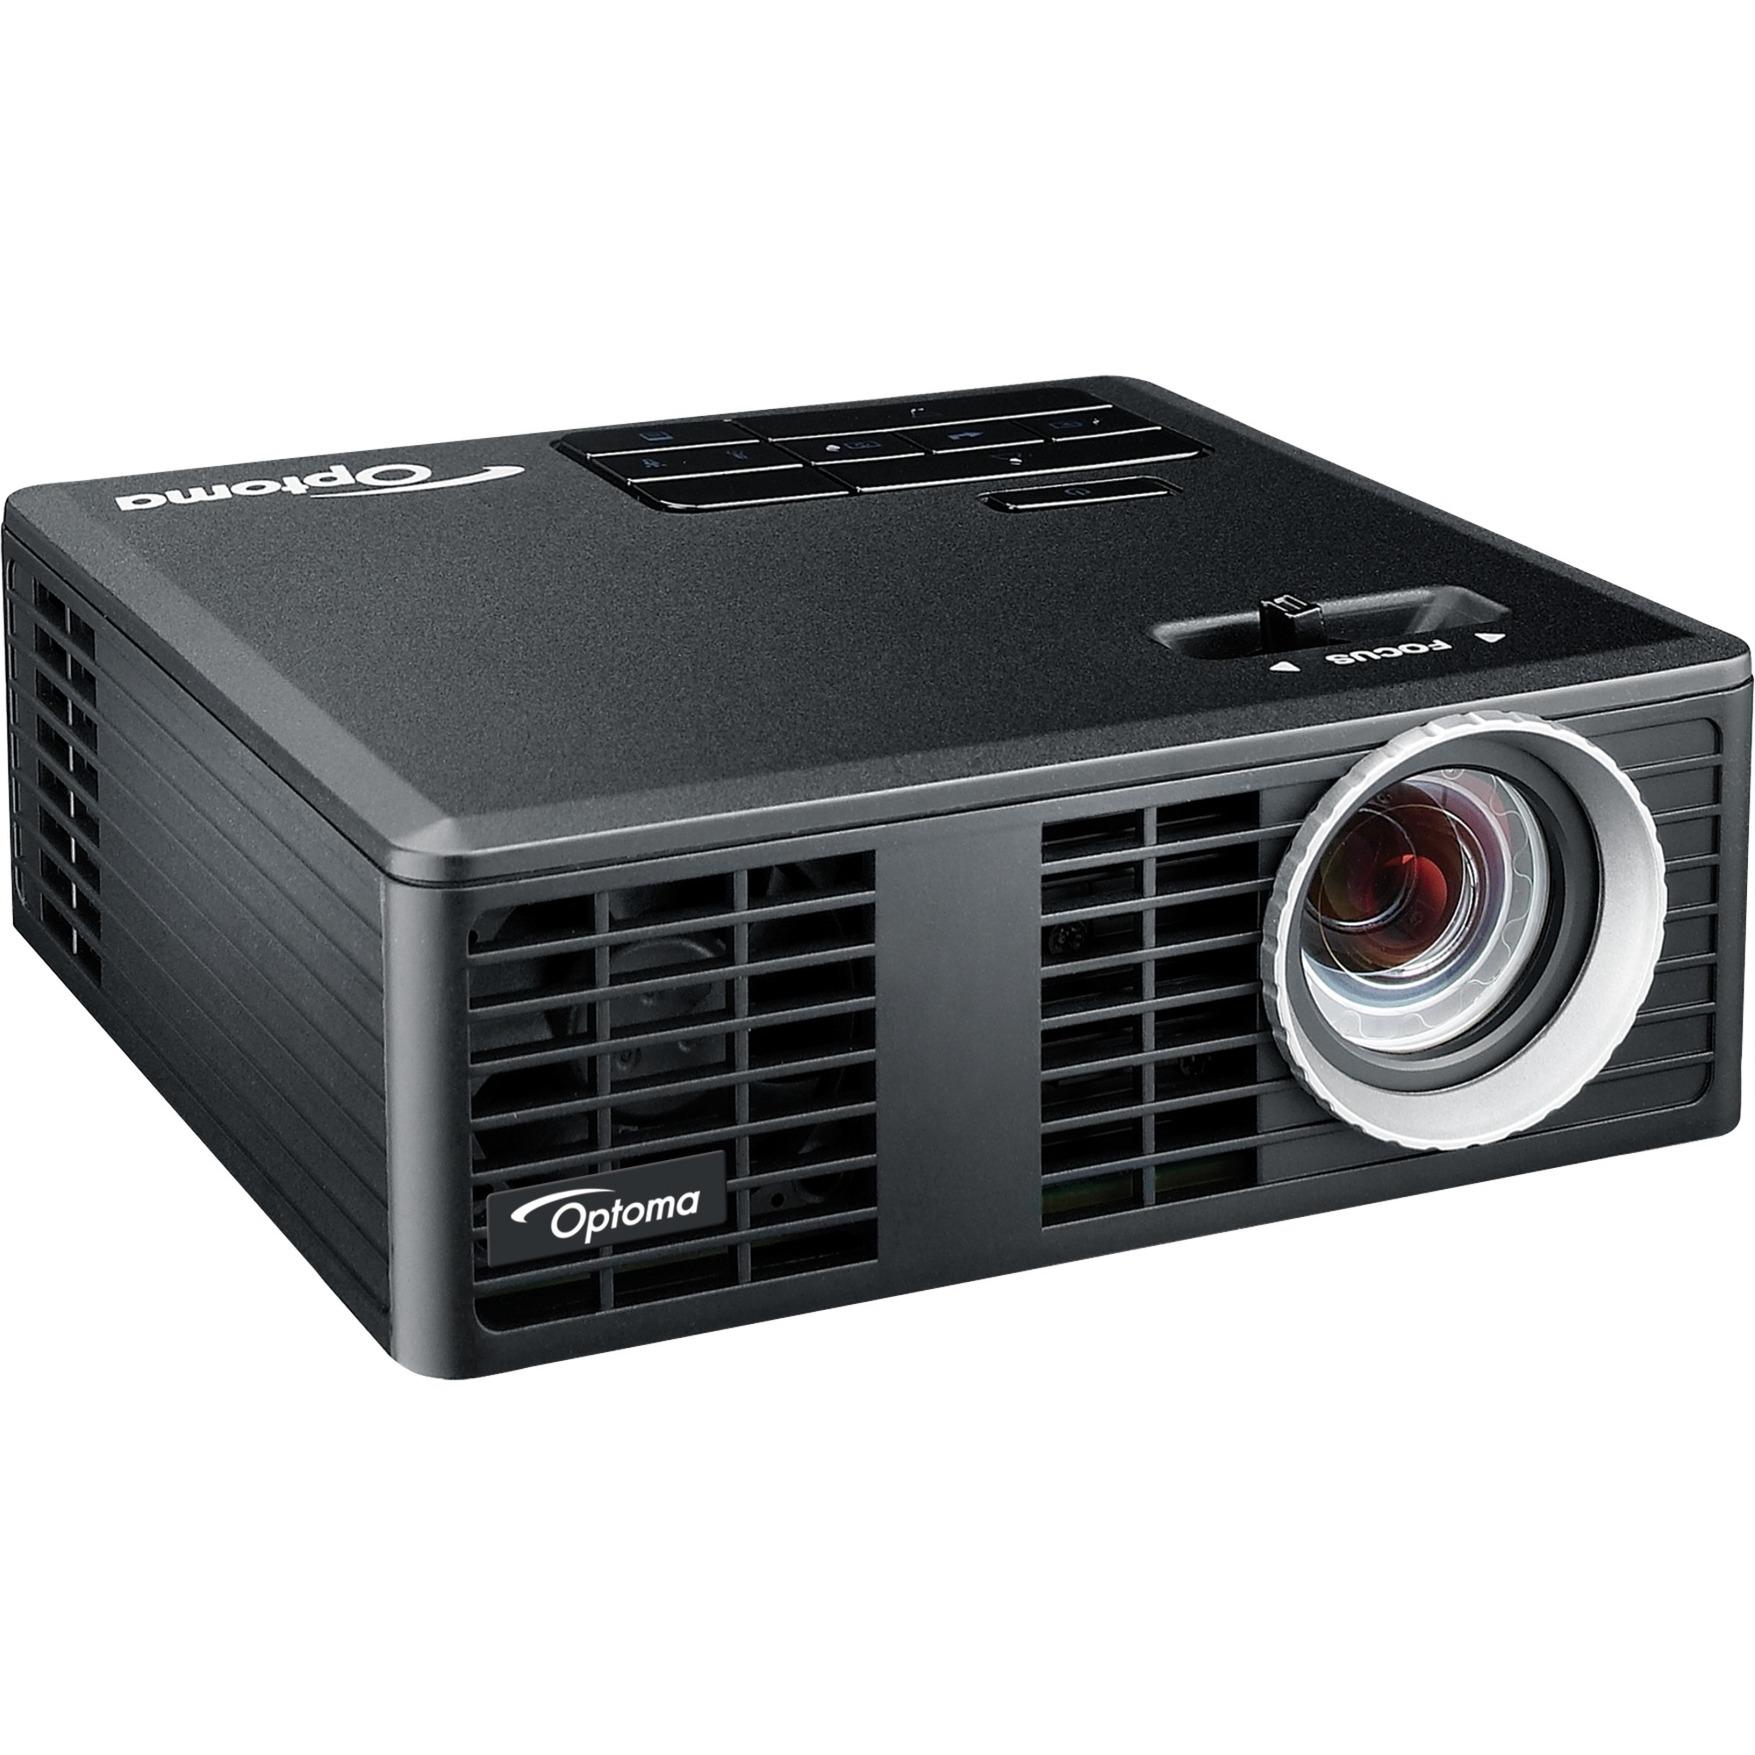 ML750e Vidéoprojecteur portable DLP WXGA (1280x800) Compatibilité 3D Noir vidéo-projecteur, Projecteur DLP